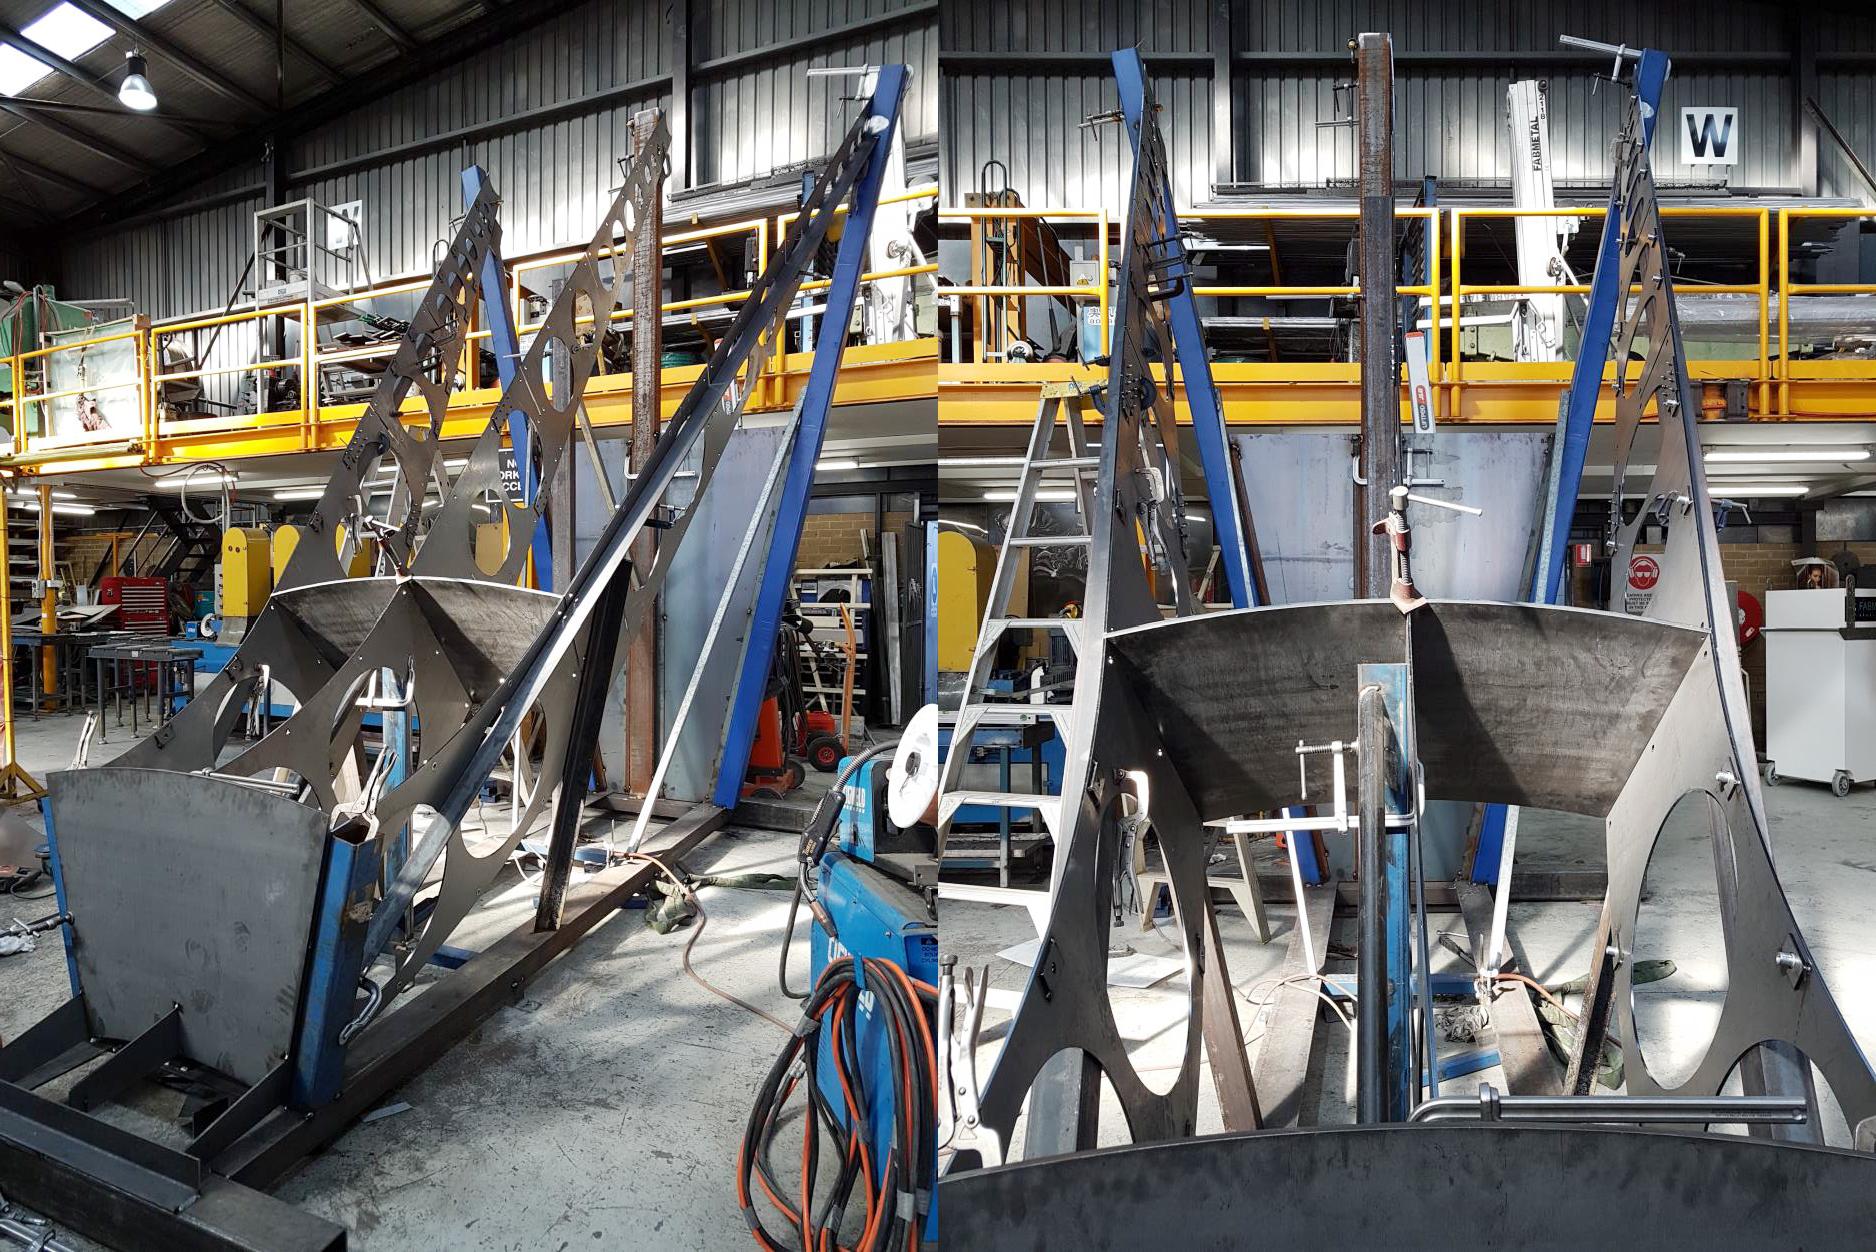 B17 Funnel  fabrication underway